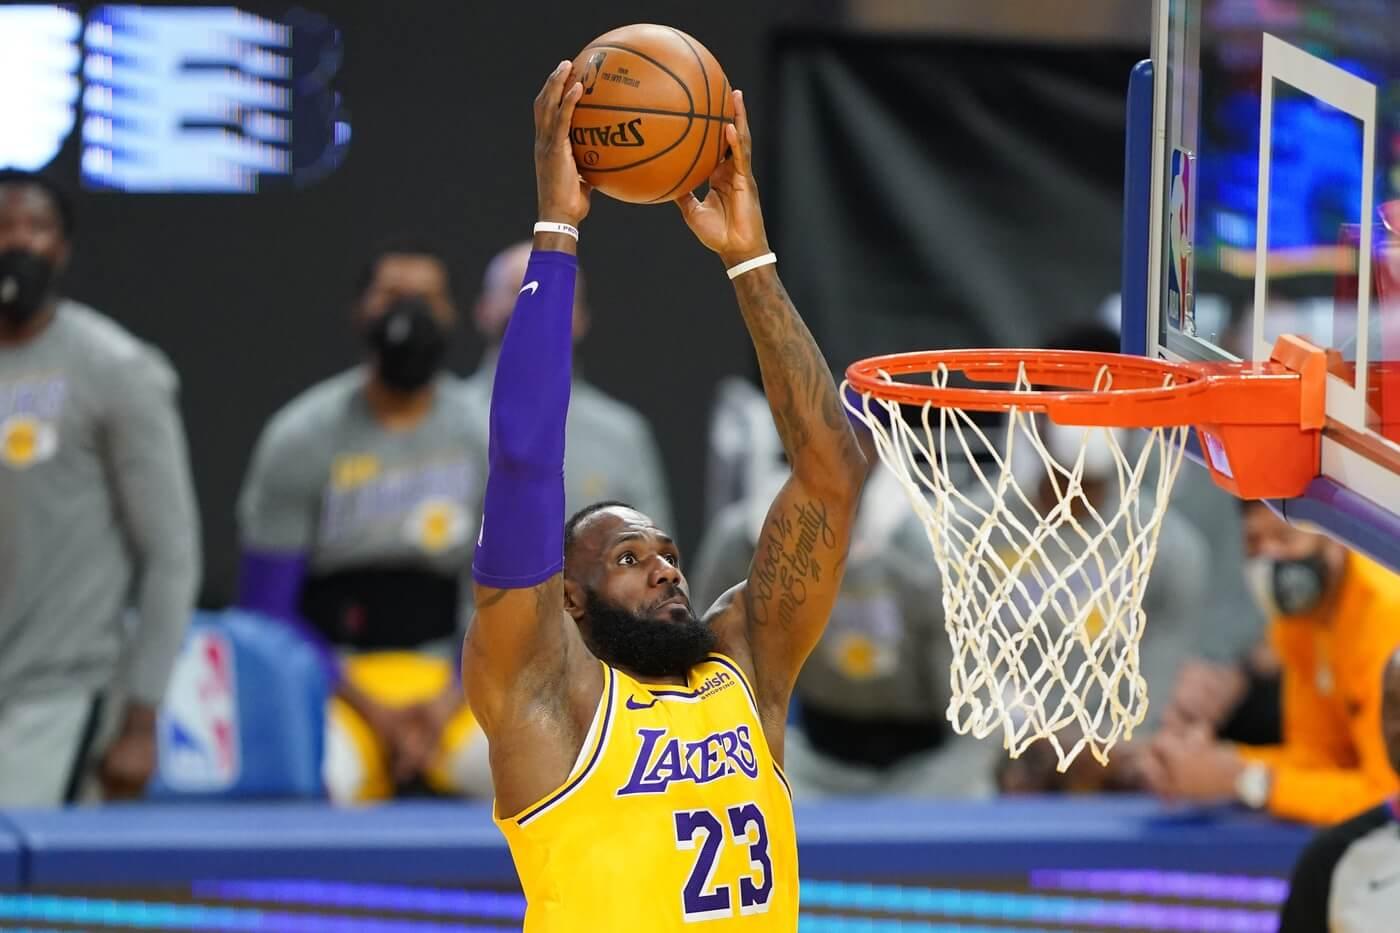 A Look at the Upcoming NBA Play-In Tournament Matchups